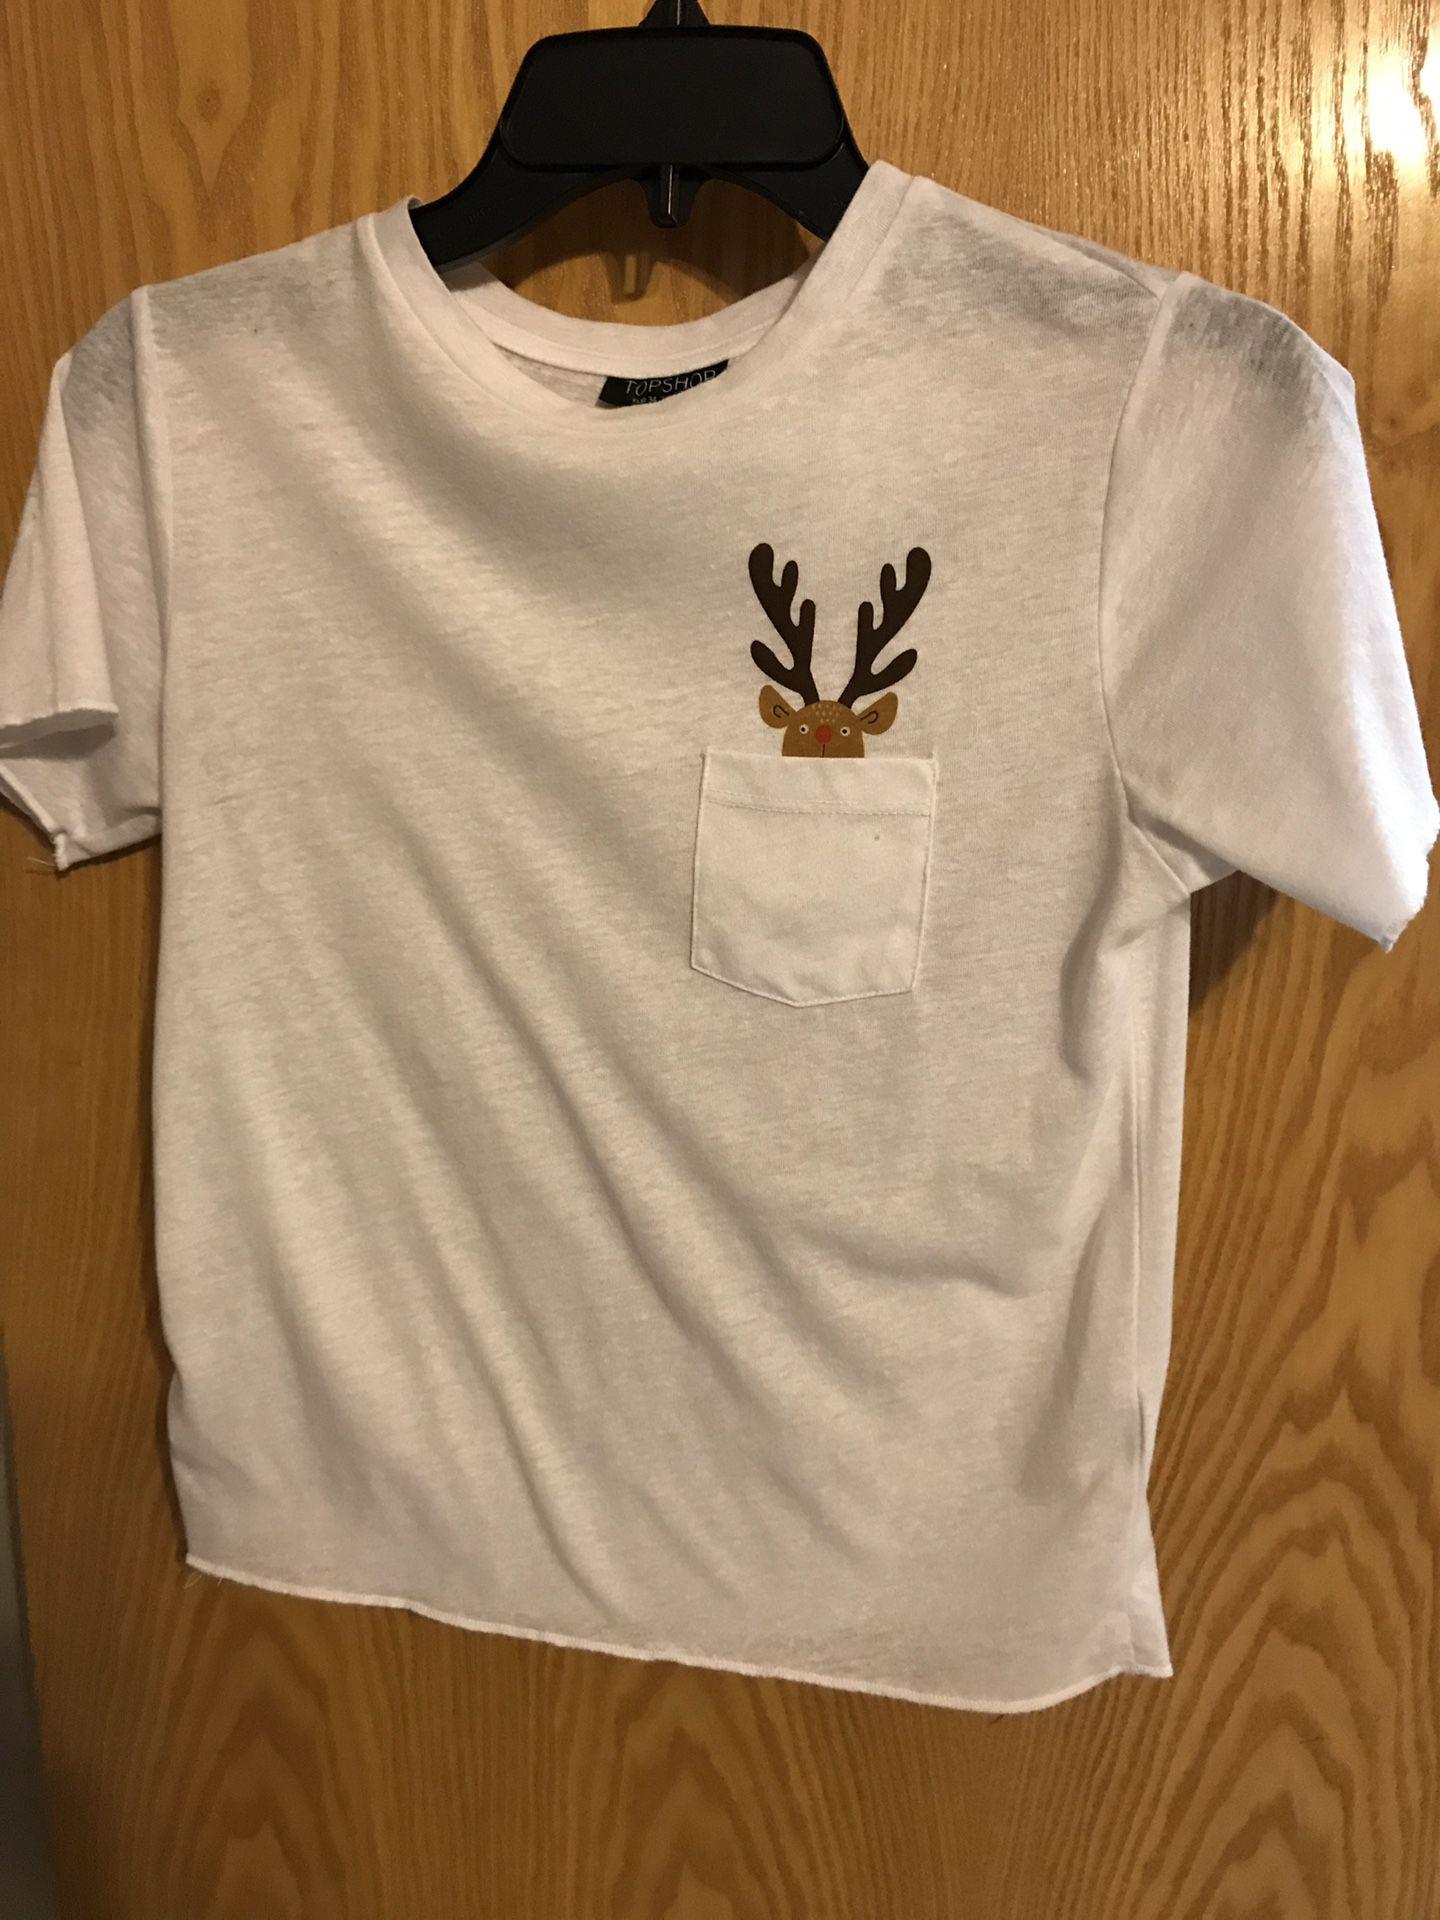 Top shop small shirt